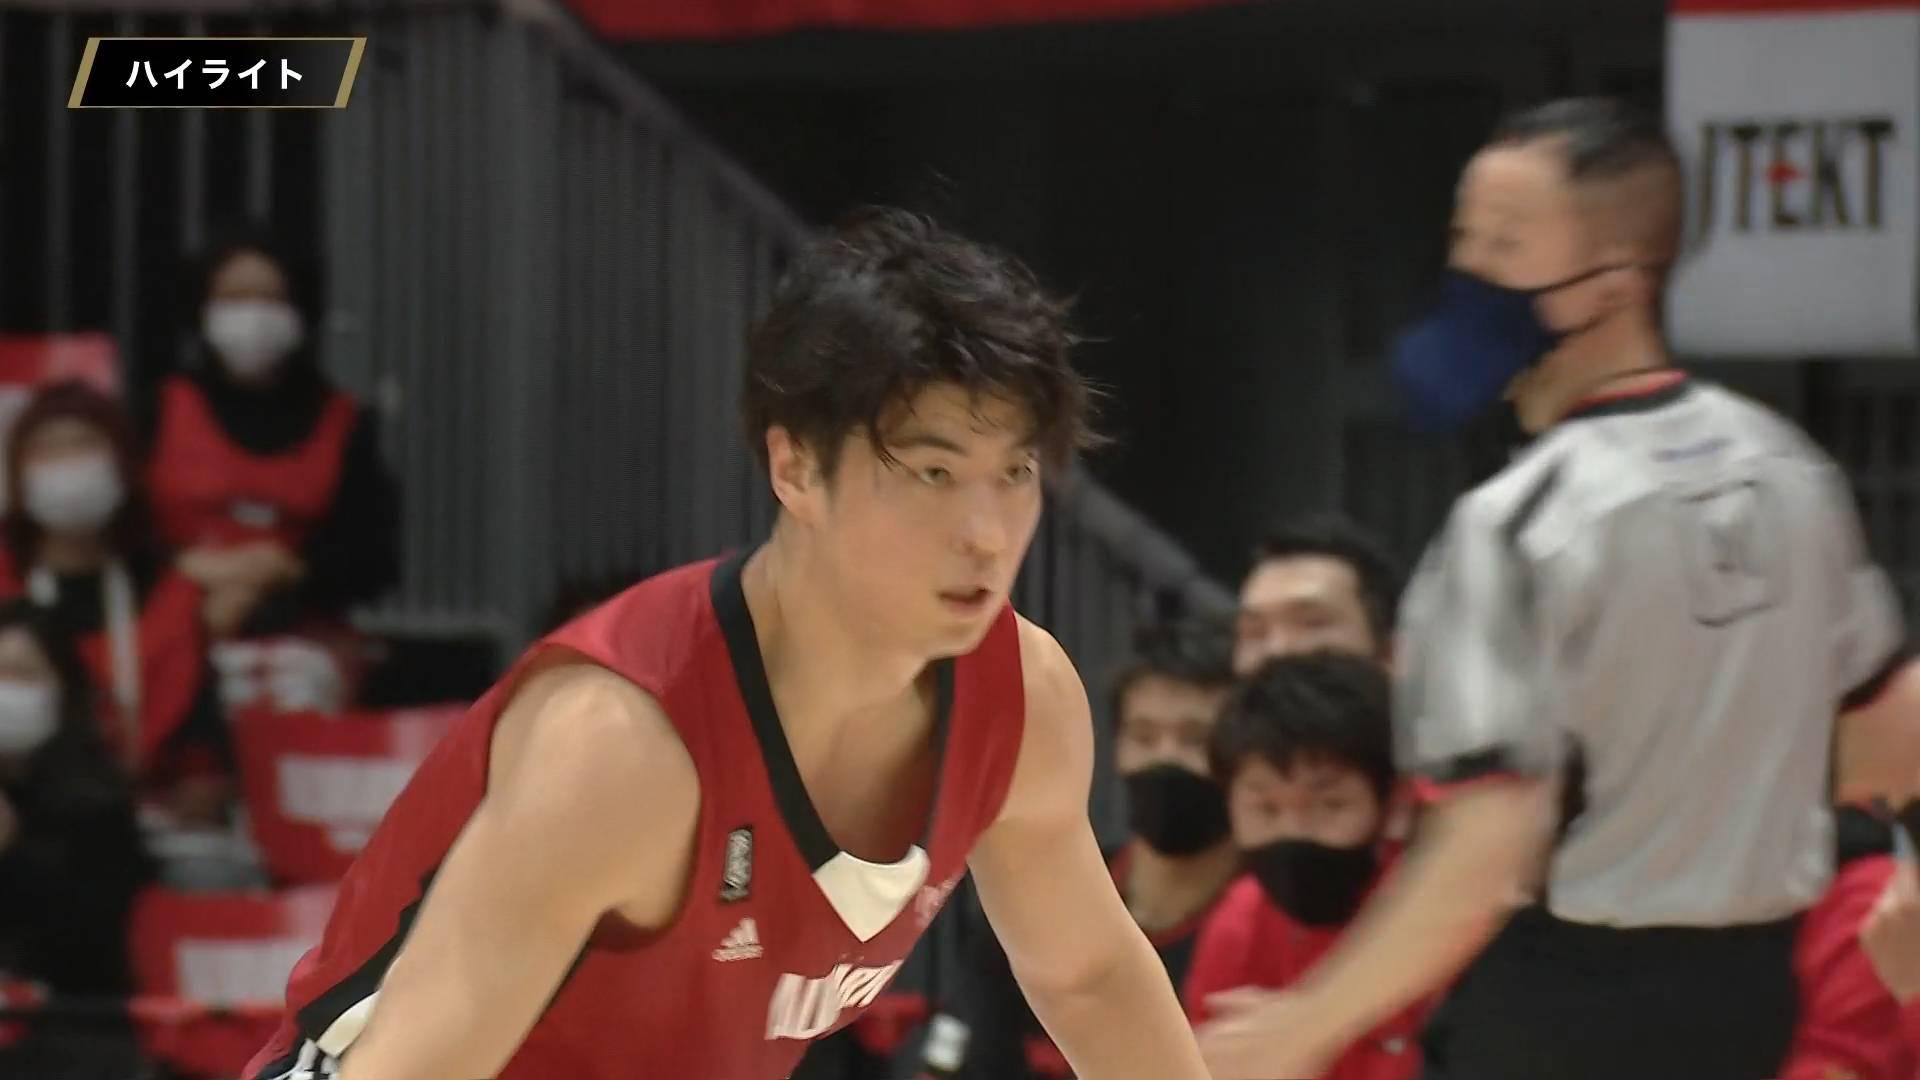 【ハイライト】3/3 A東京 vs 富山(20-21 B1第25節)